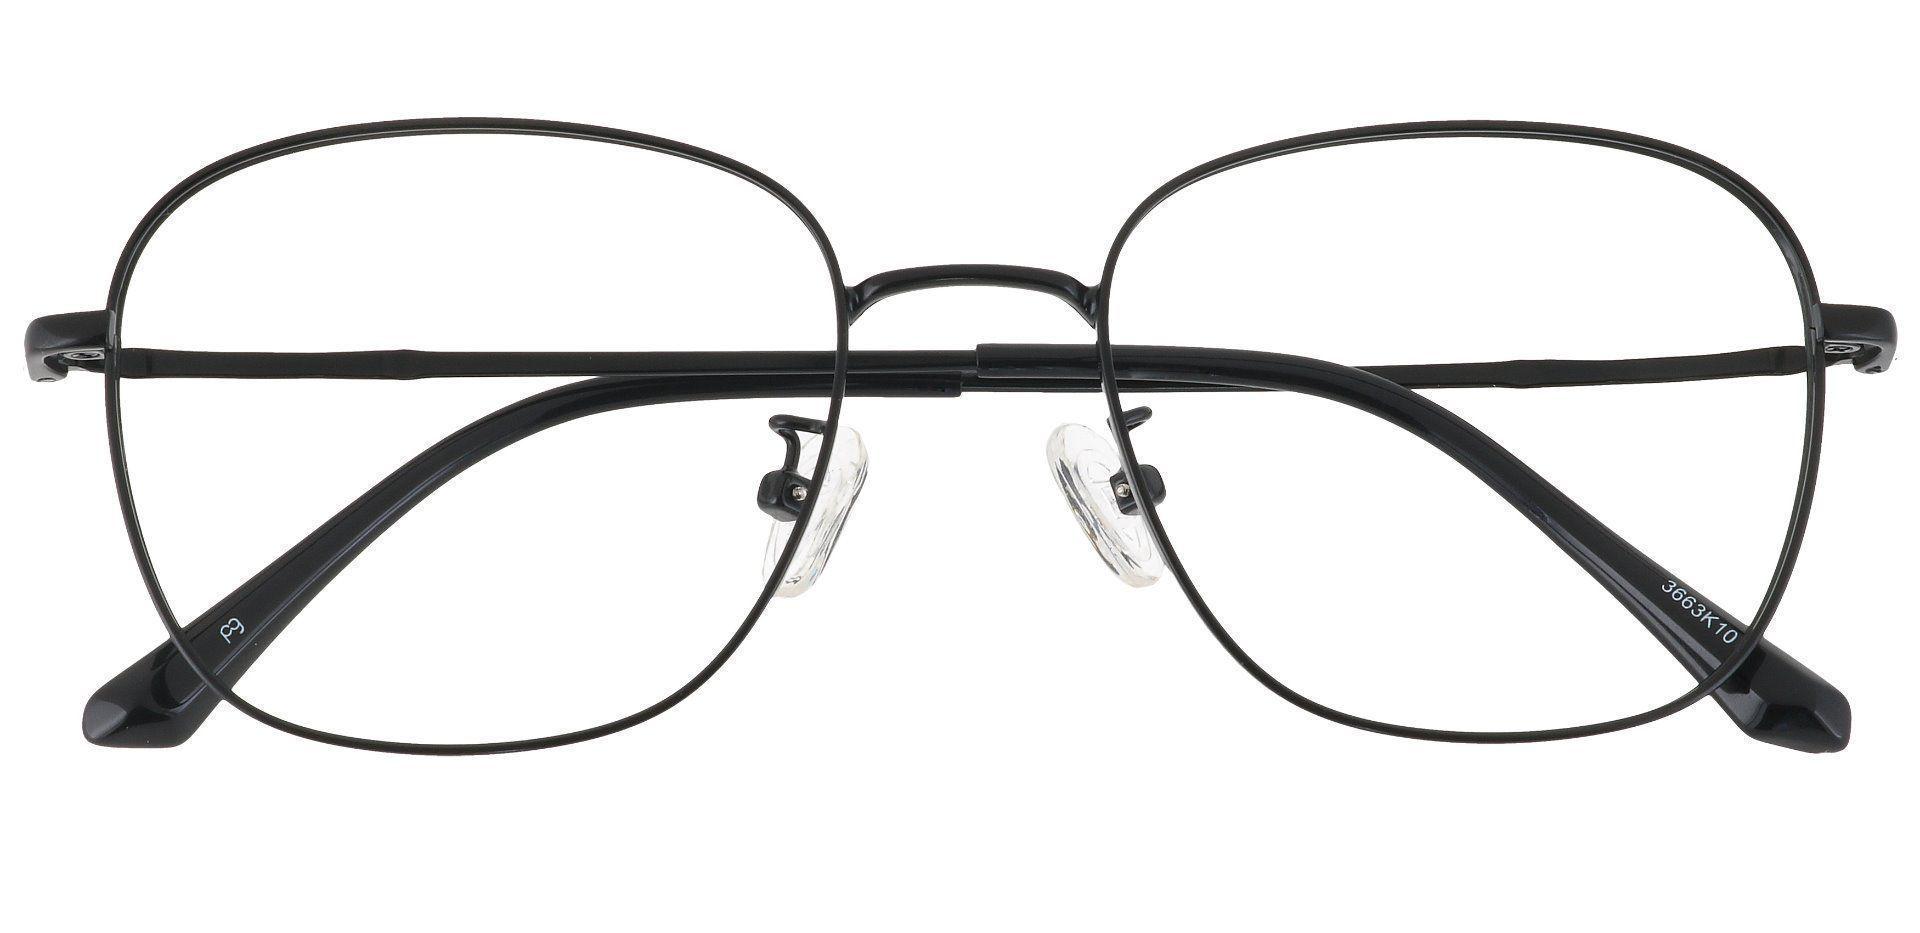 Fresno Square Prescription Glasses - Black